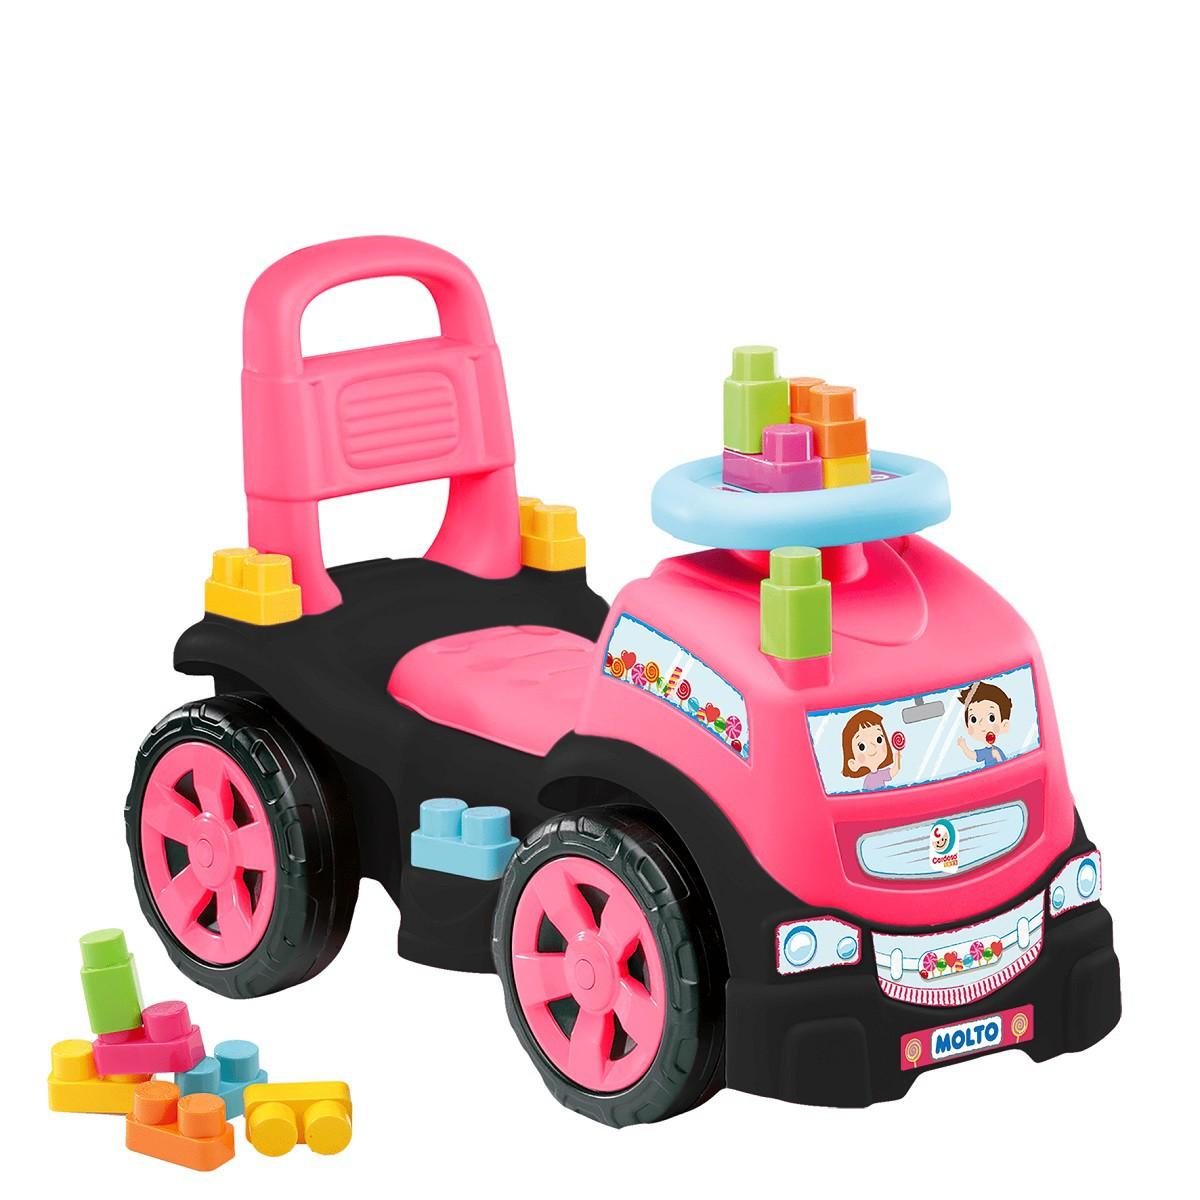 Totoka De Empurrar Blocks Truck In Ride Baby Land Menina - Cardoso Toys